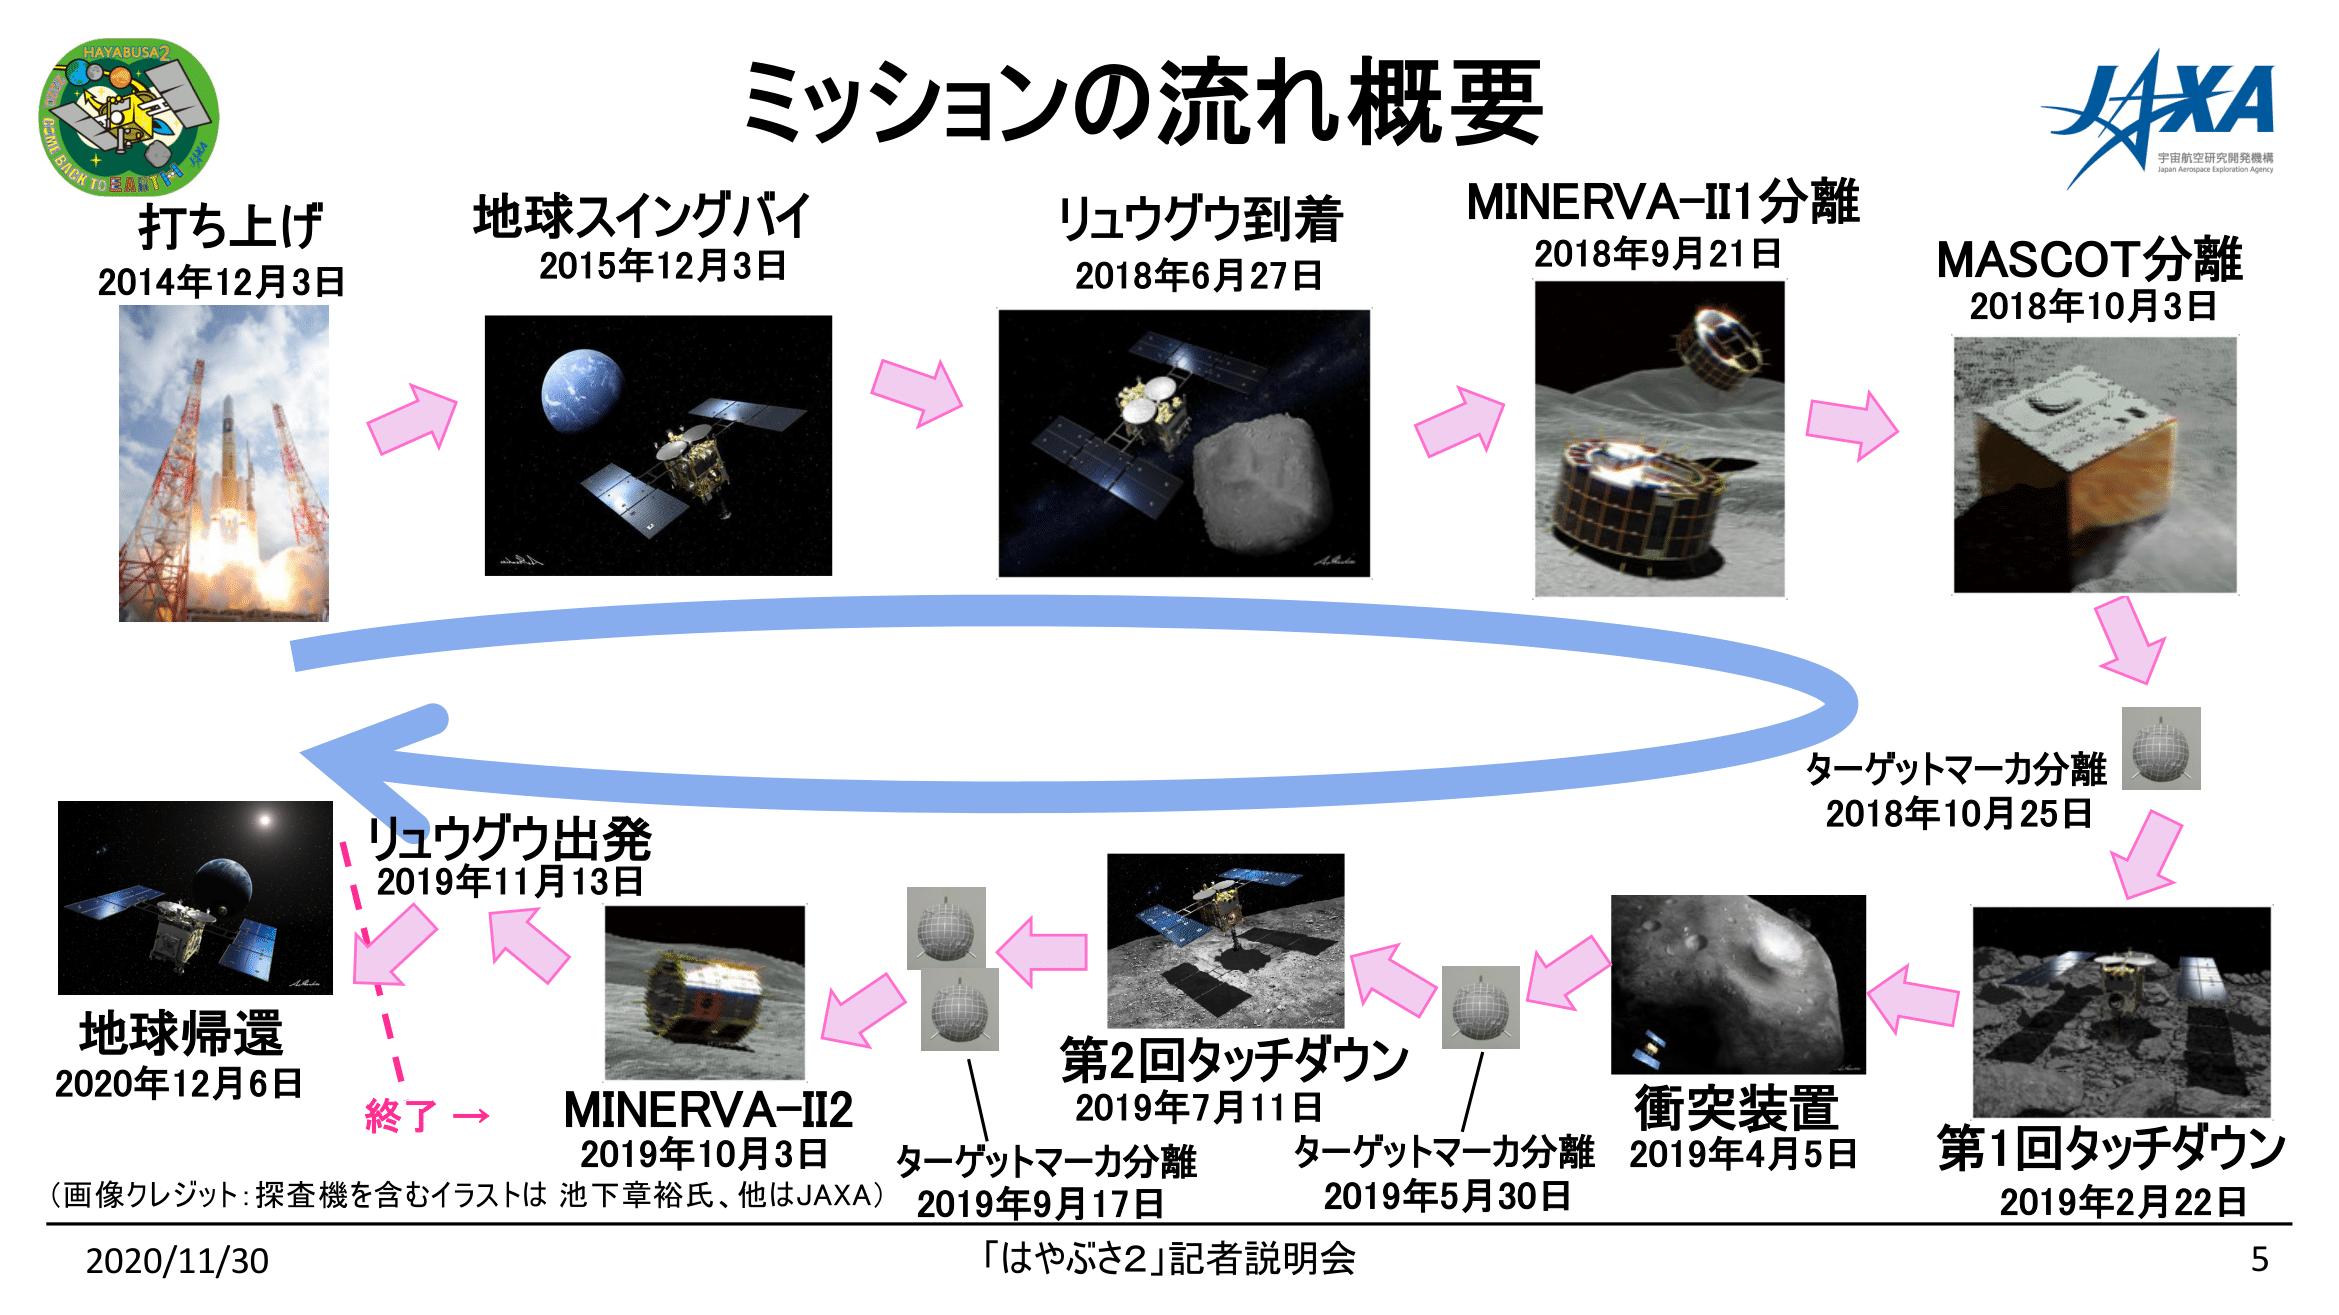 f:id:Imamura:20201130153945p:plain